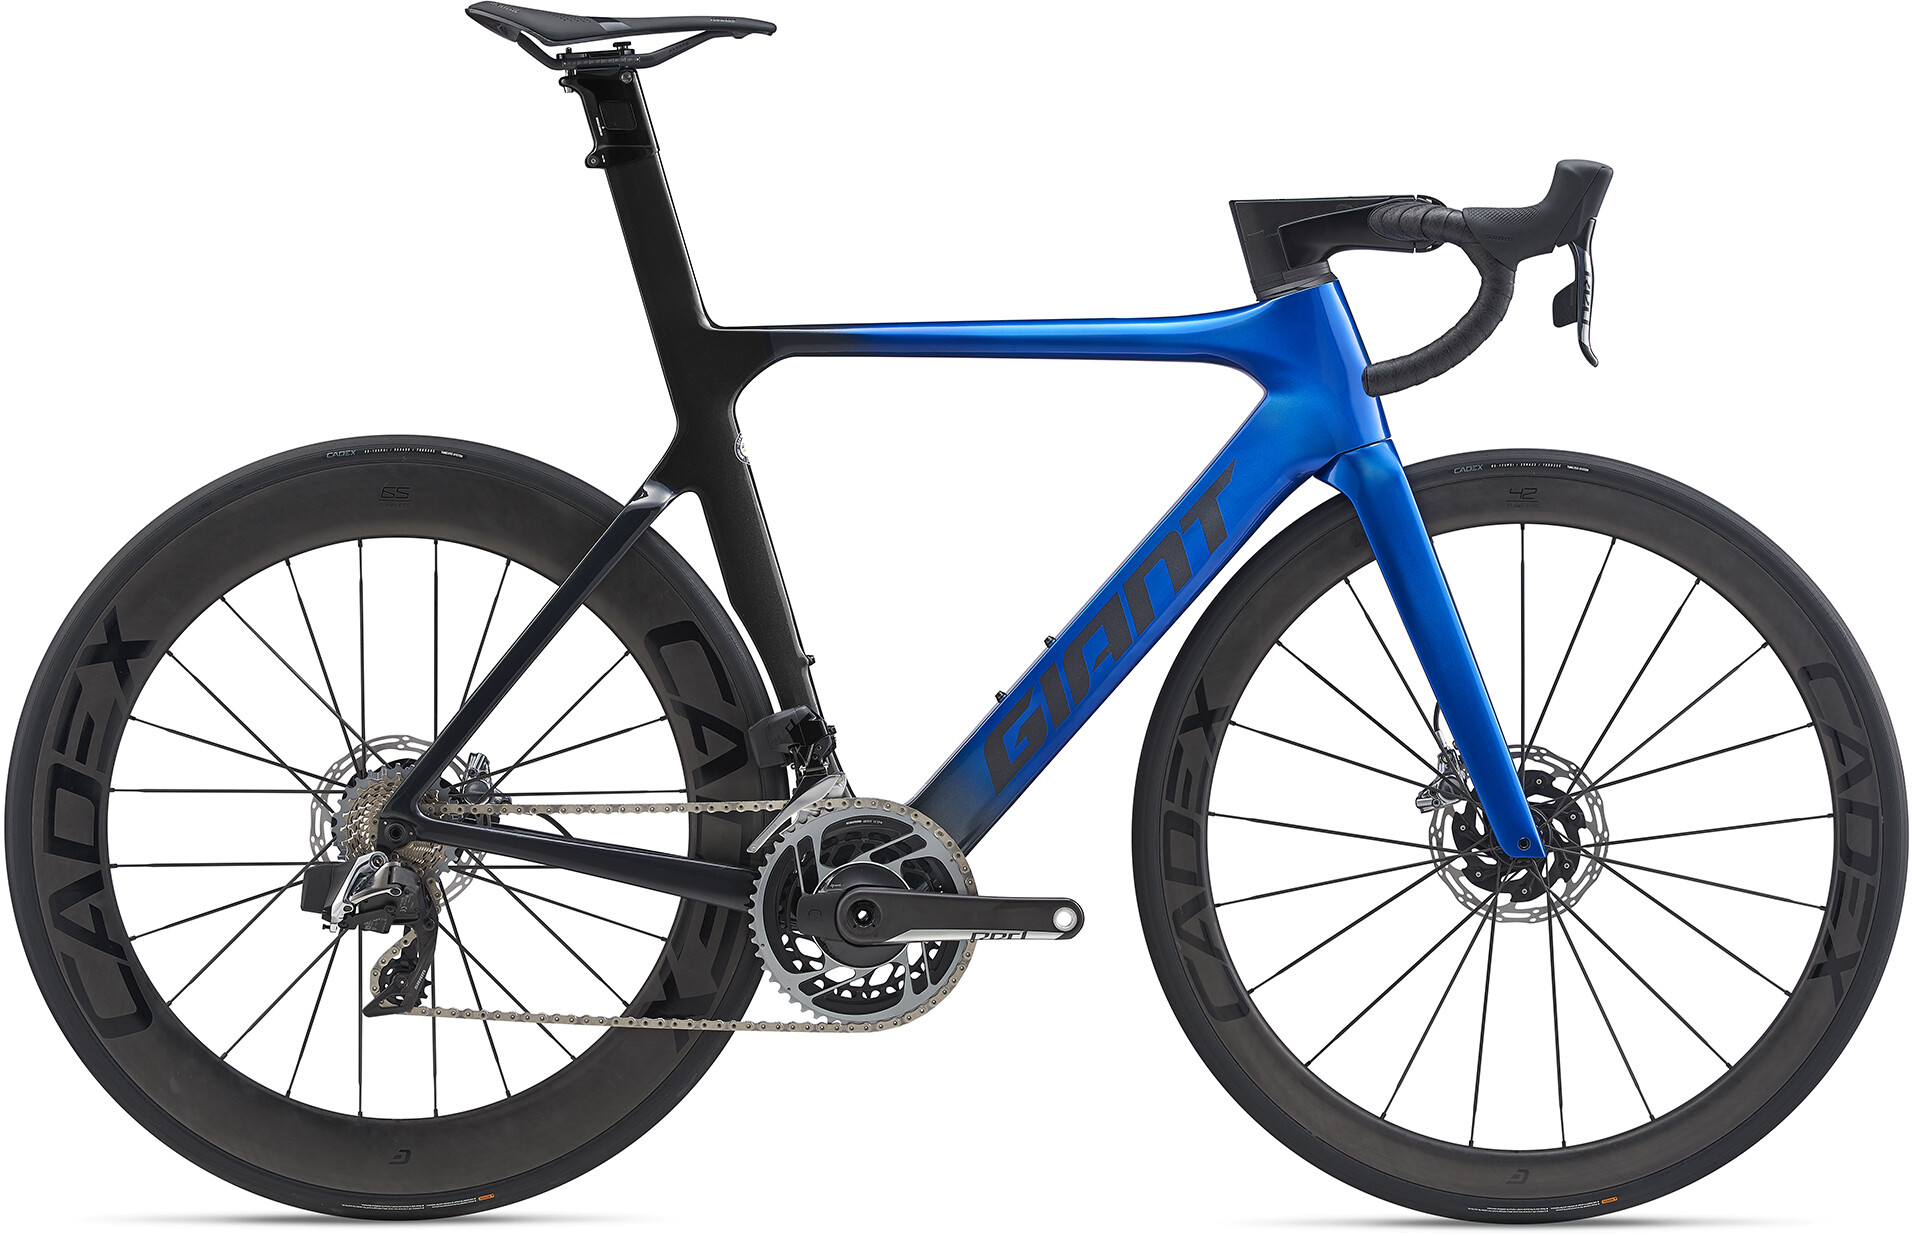 //-7 Threadless Fixie Road Bike Bicycle 25.4 Handlebar Stem Silver Alloy 50mm